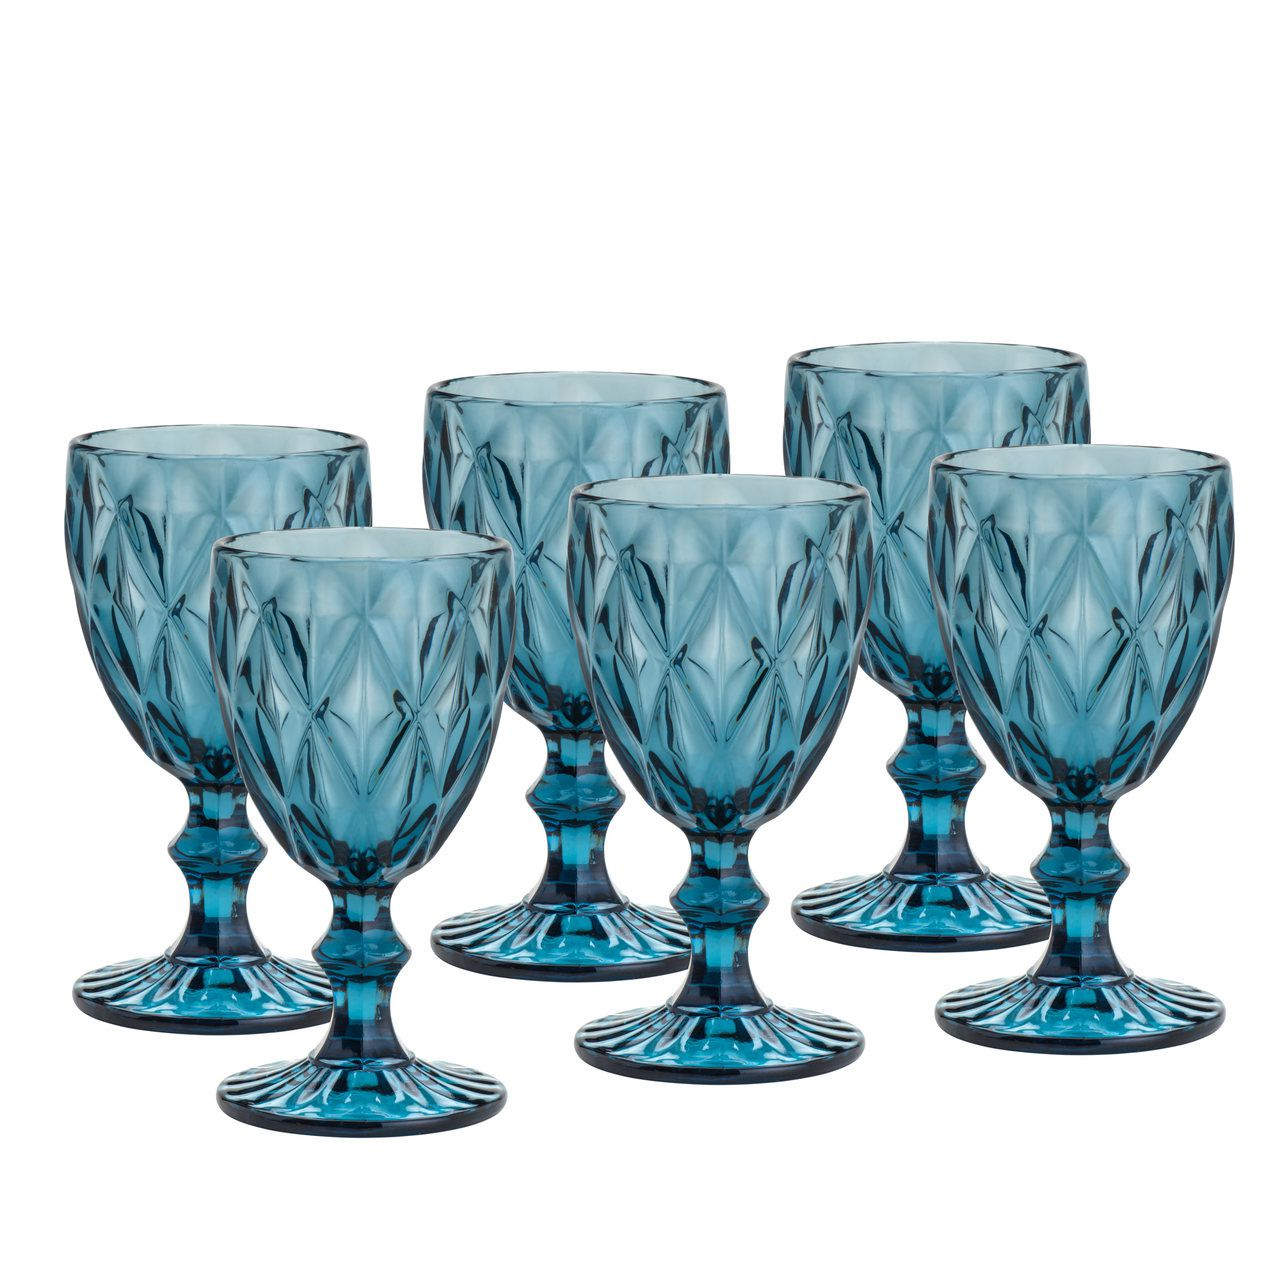 Jg 06 Taças Diamond p/ Água de Vidro Azul 325ml